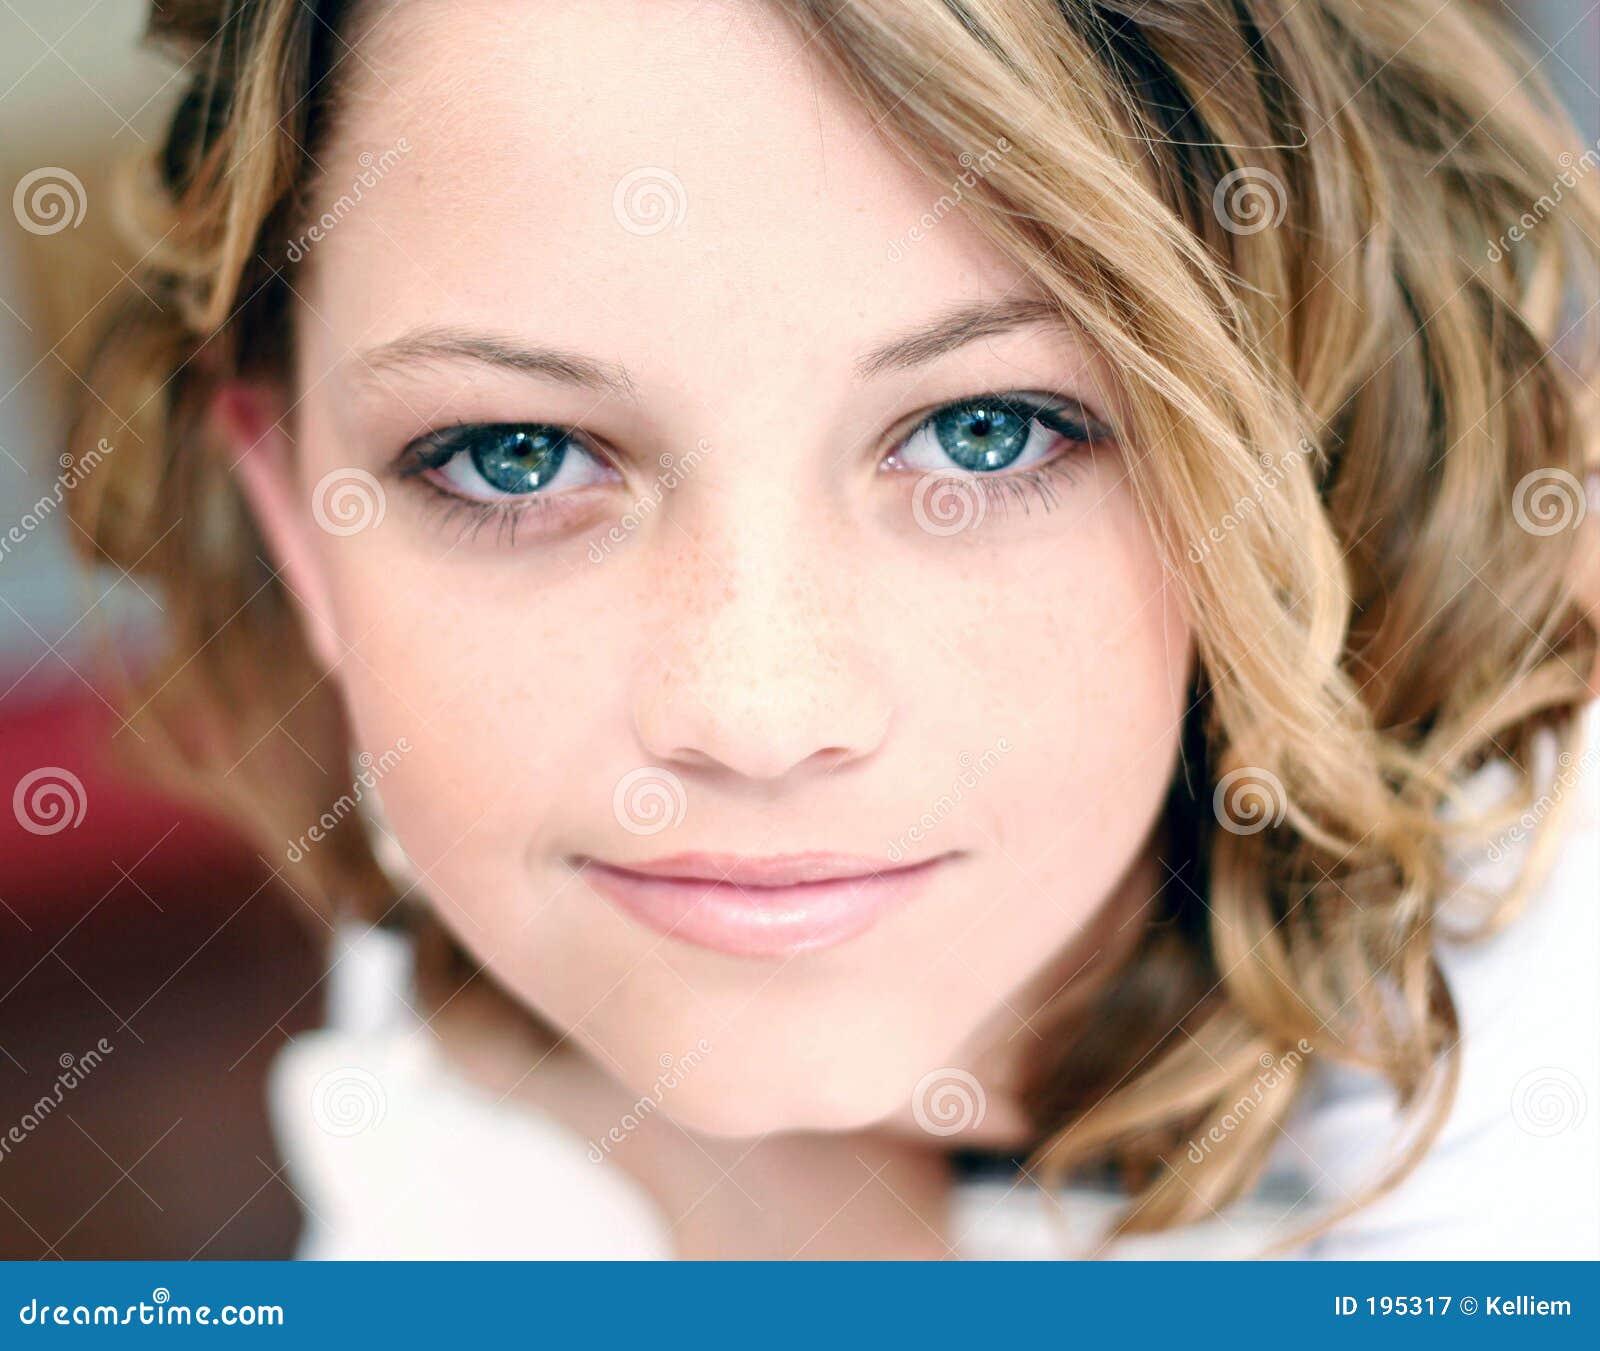 Model Close Up Stock Image. Image Of Female, Woman, Blue